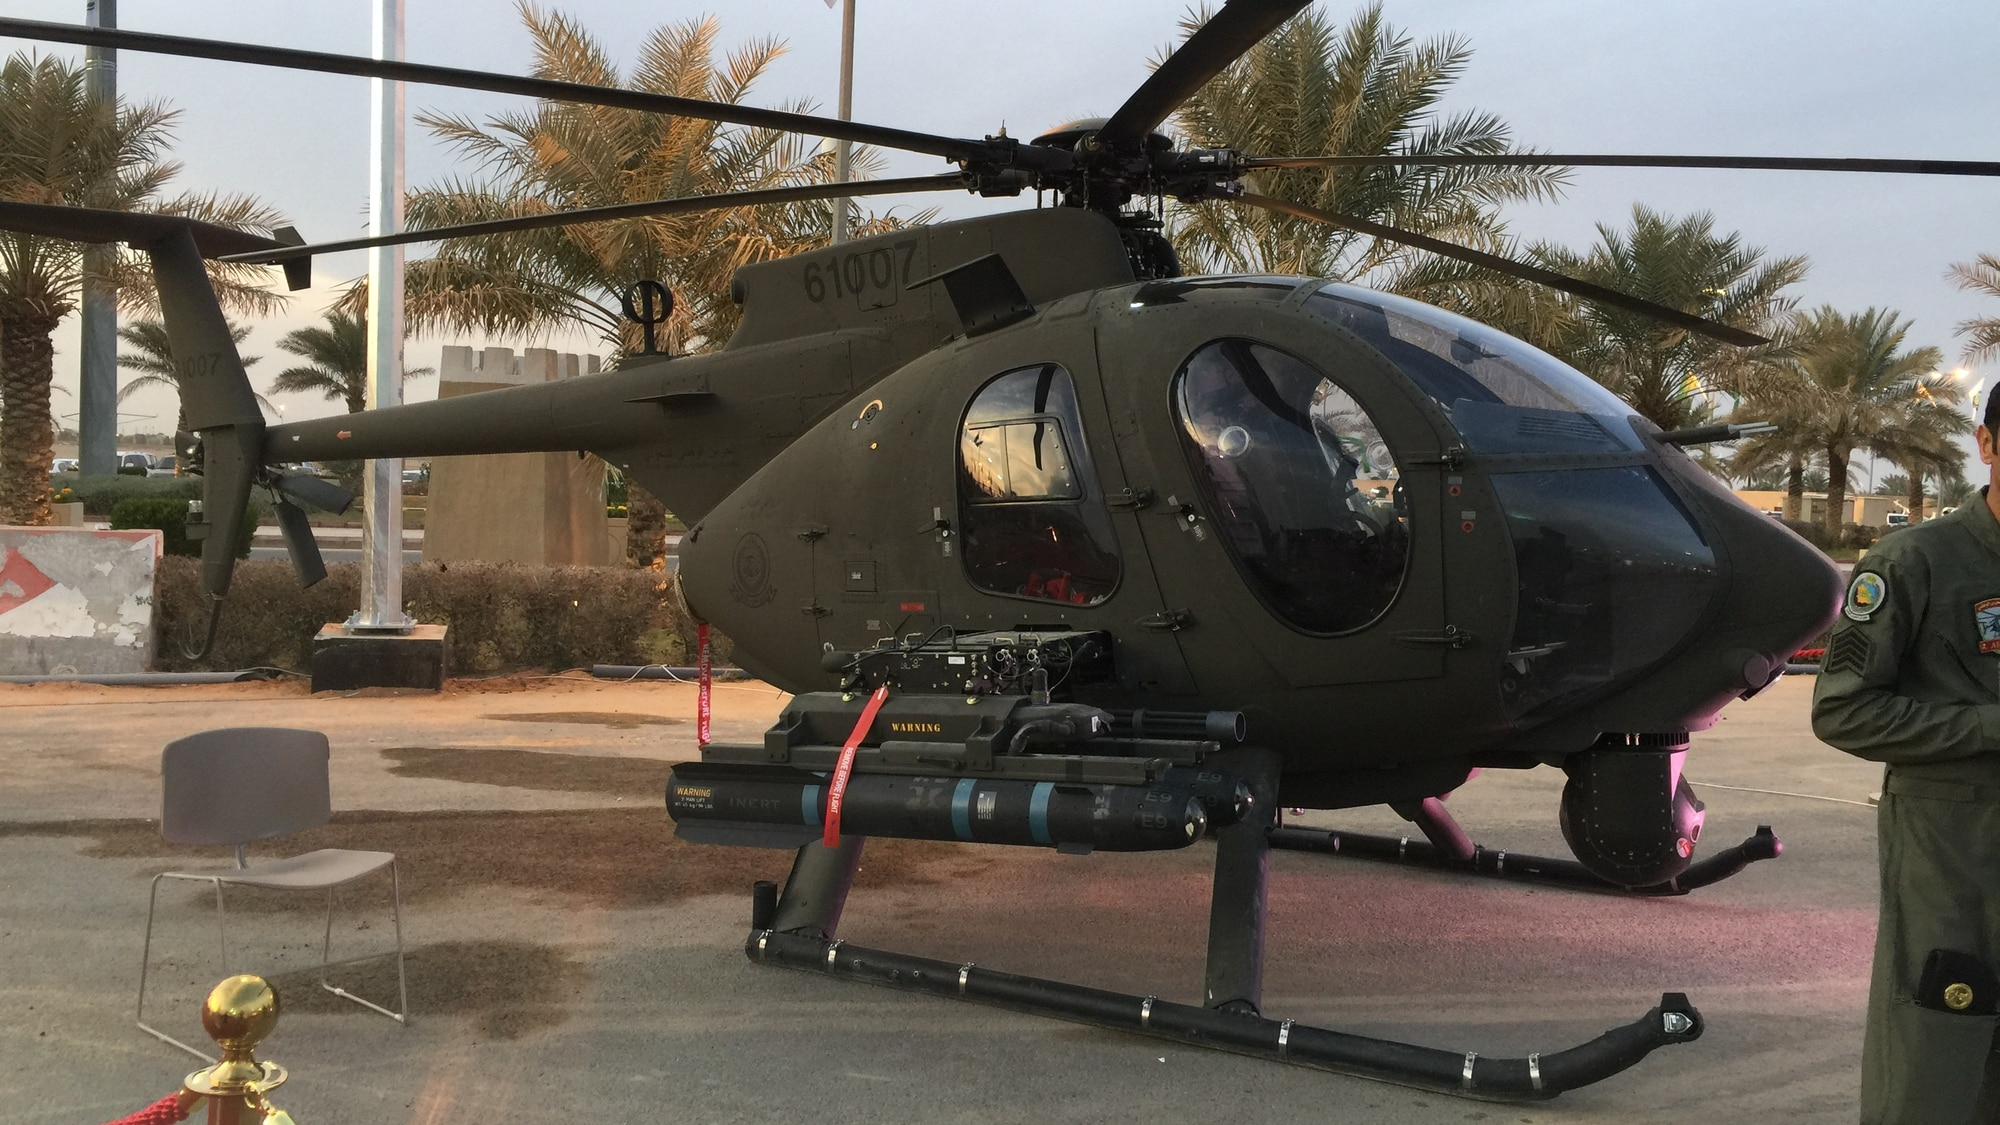 A Saudi Arabian National Guard AH-6i light attack helicopter sits on display Feb. 10, 2018. (Wikimedia)